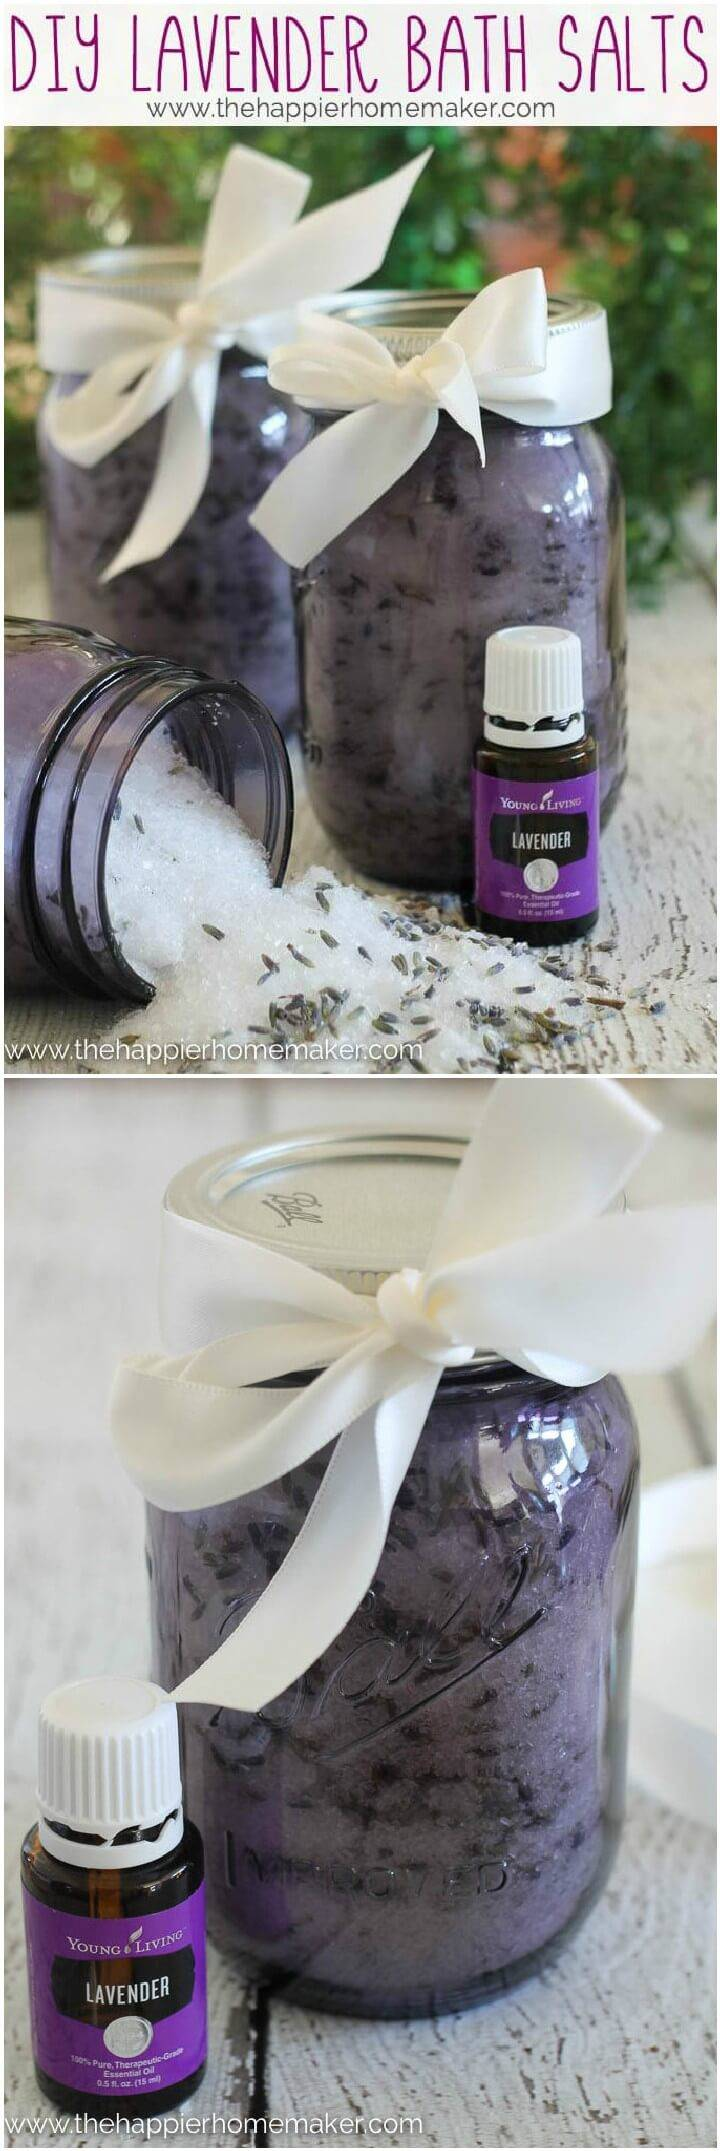 DIY Lavendar Bath Slats Mason Jar Gifts